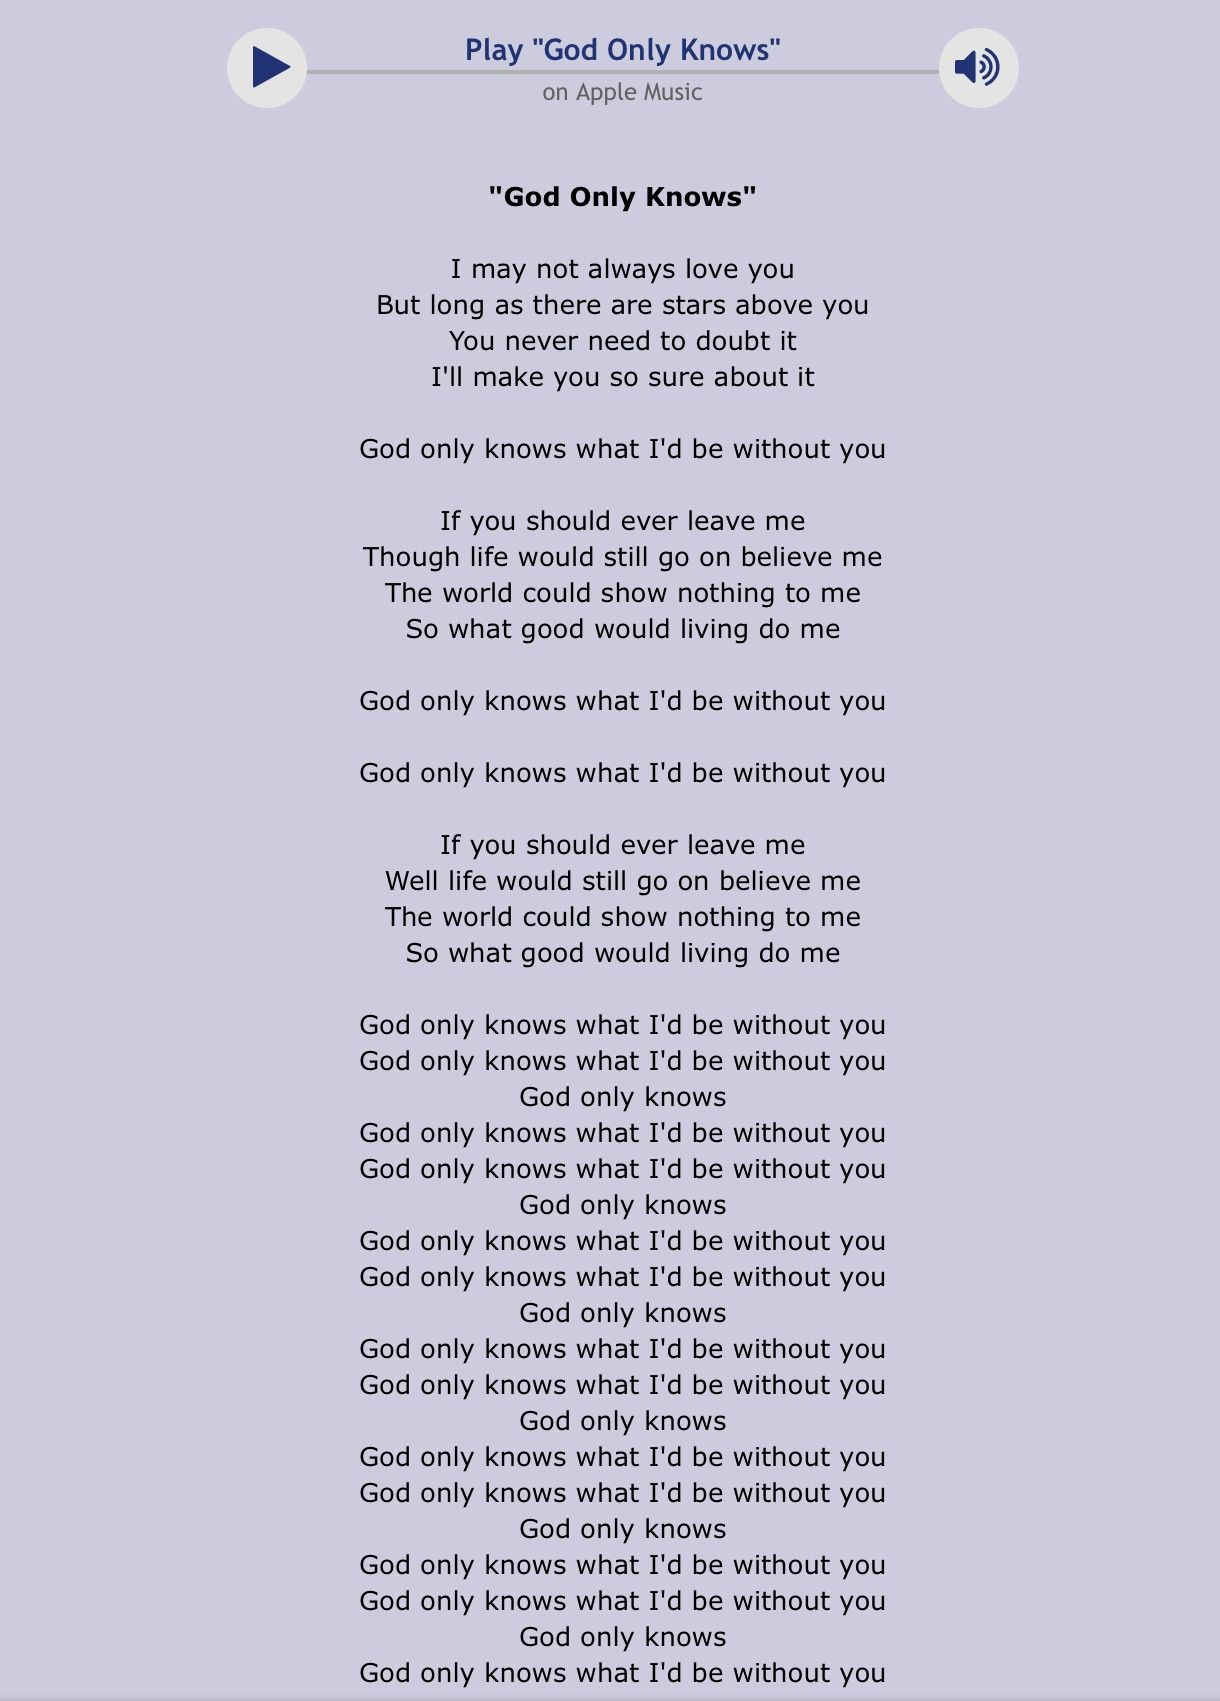 Pin By Hedy Laviolette On Lyrics Great Song Lyrics Uplifting Songs Music Lyrics